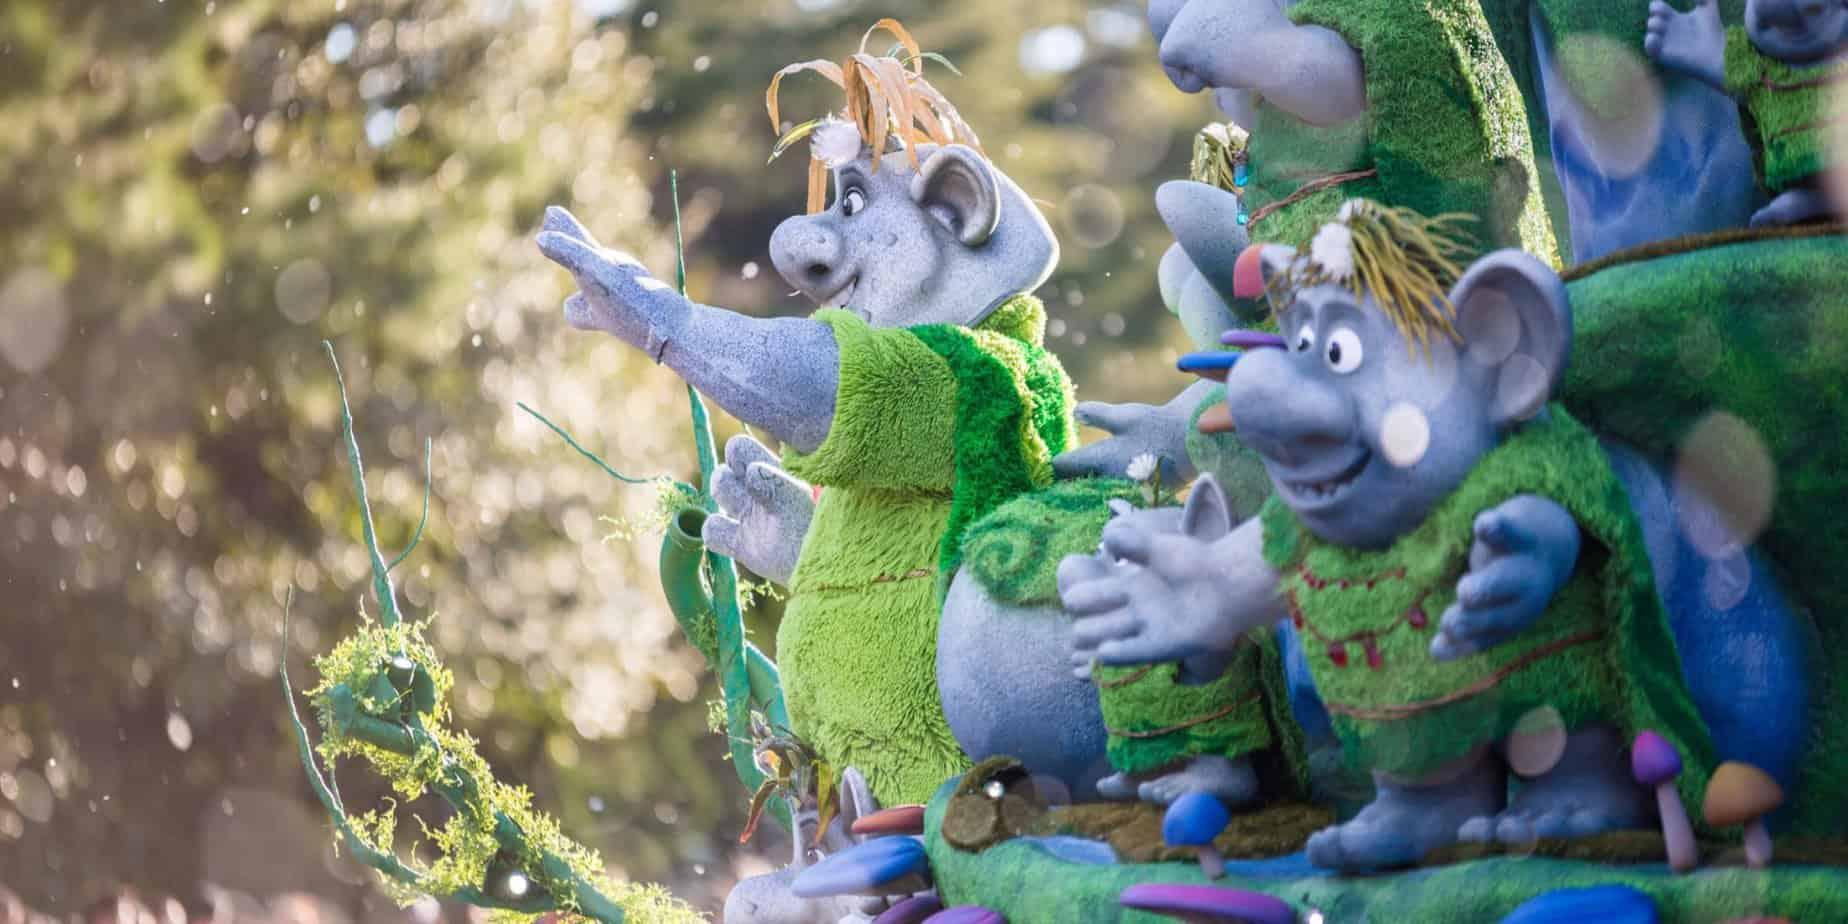 Guide to Anna and Elsa's Frozen Fantasy 2017 at Tokyo Disneyland